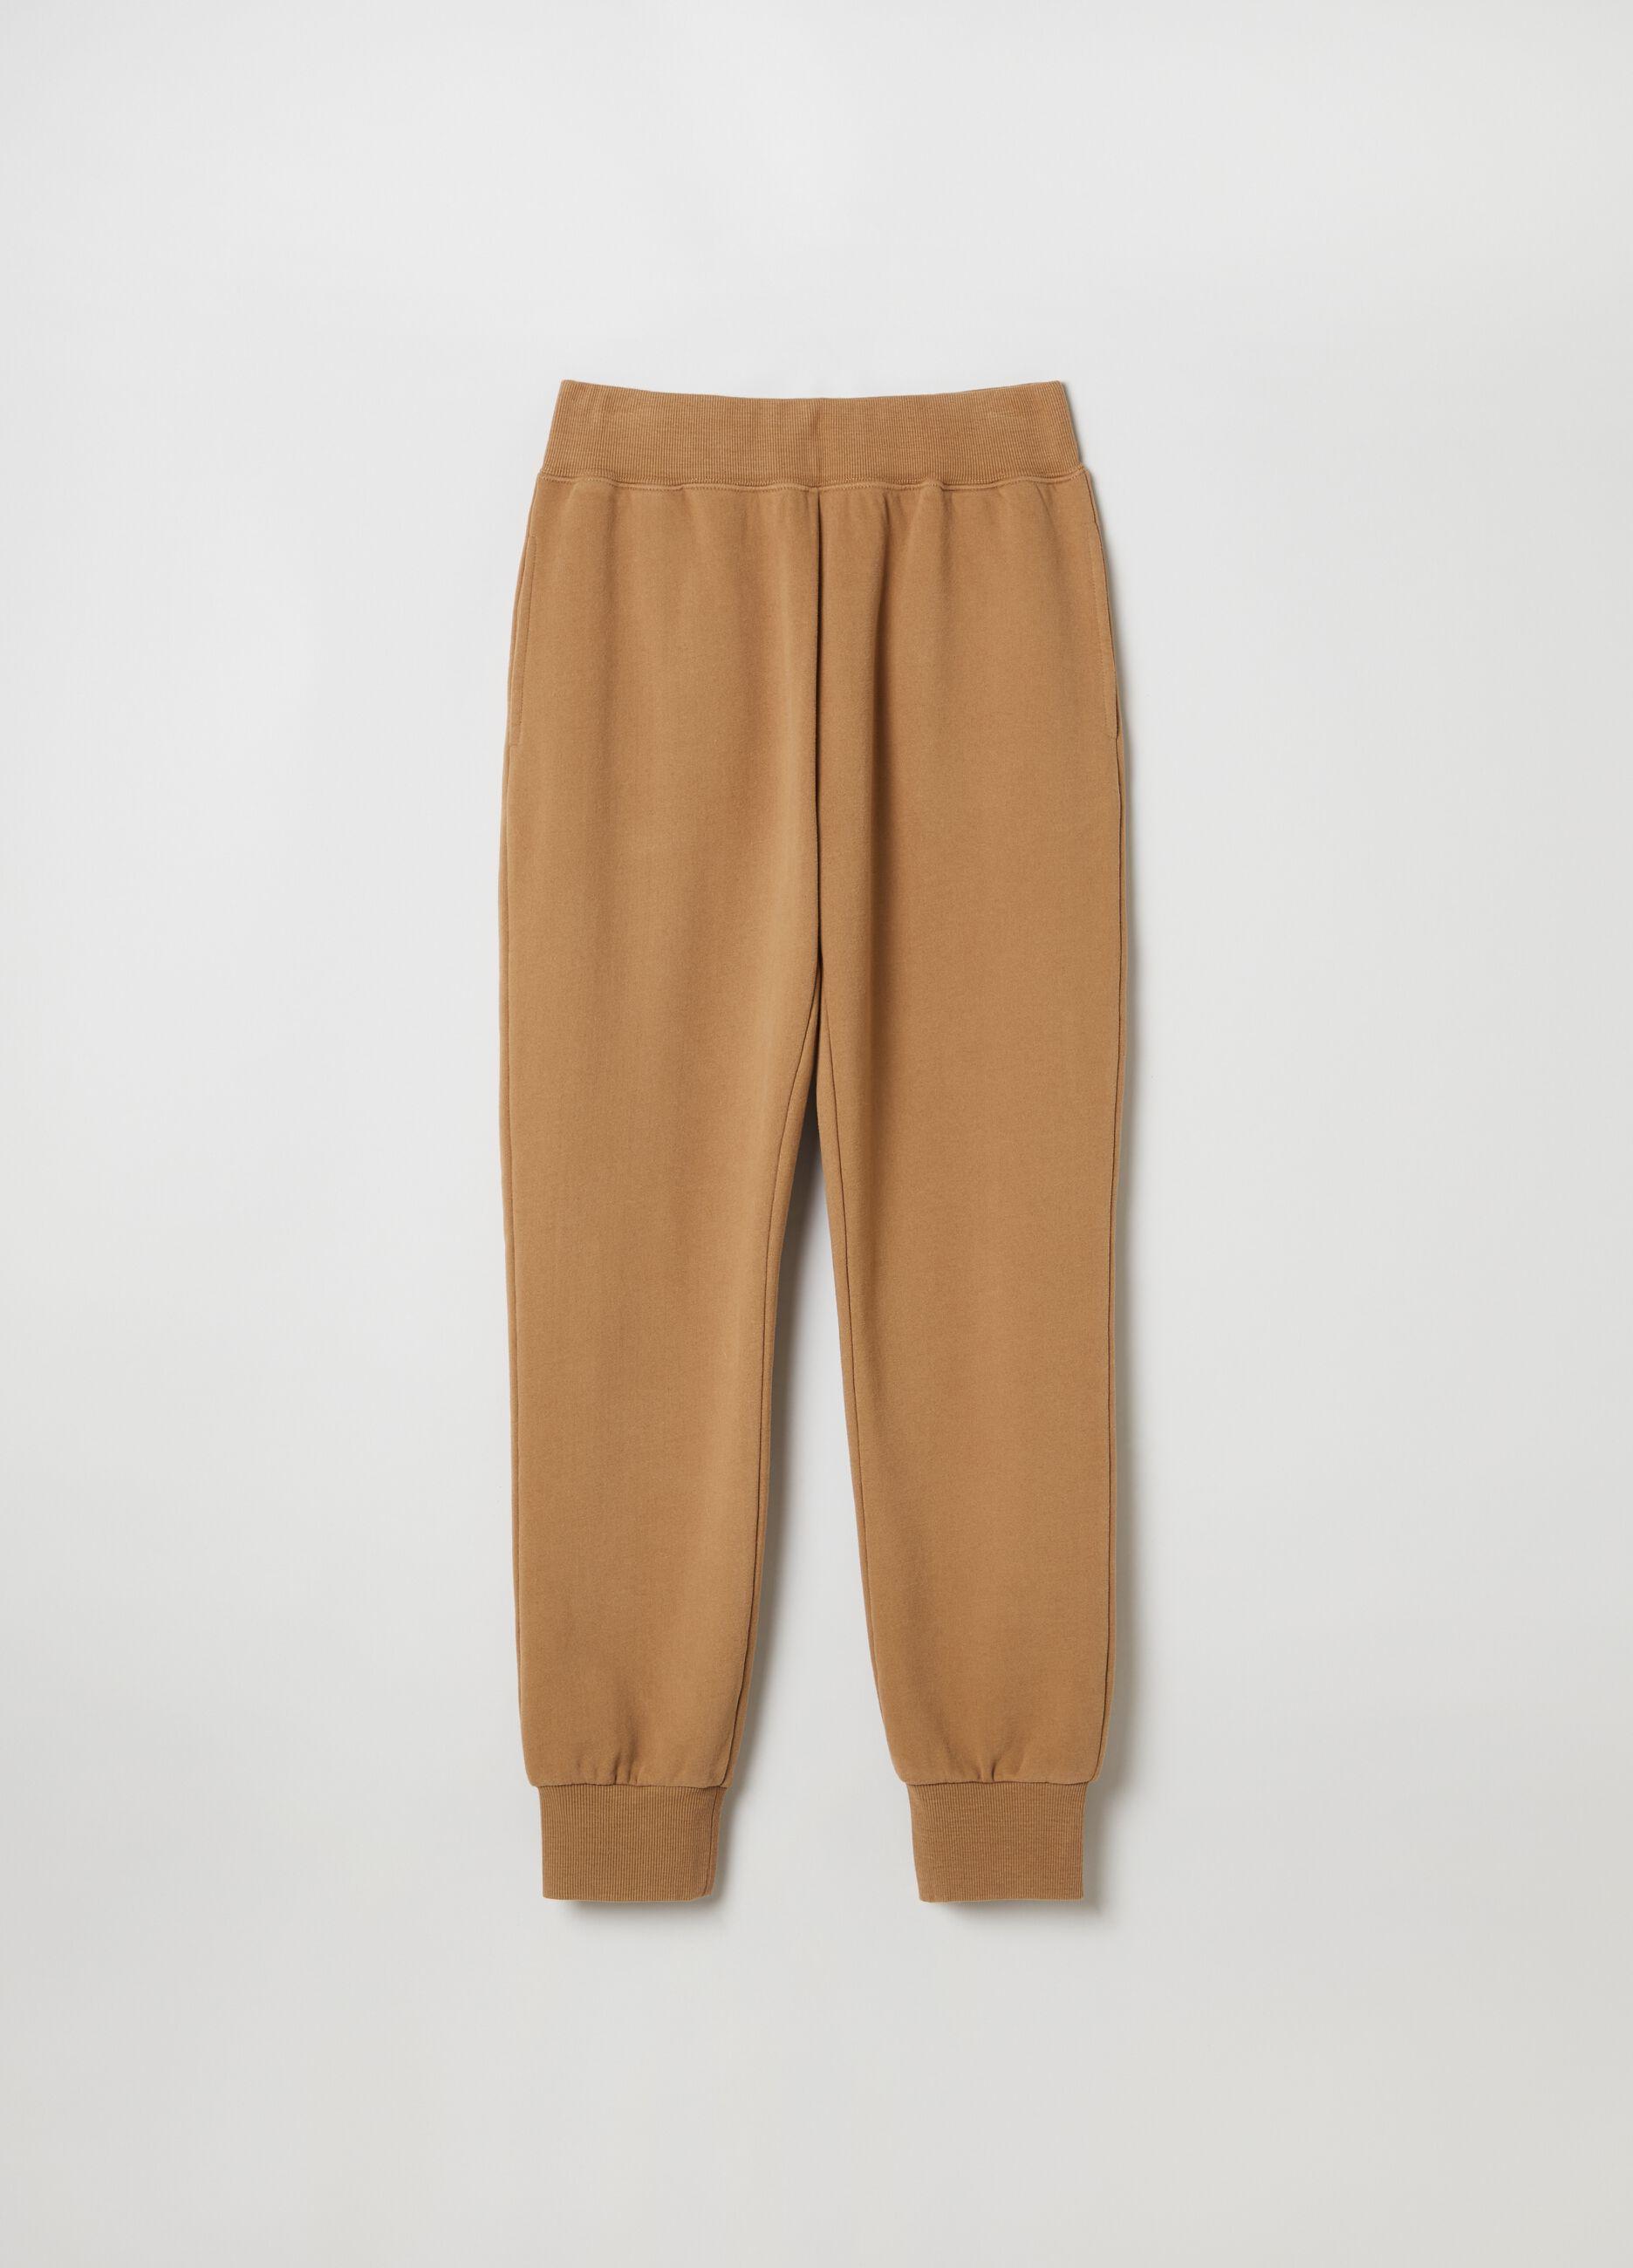 Pantalone jogging in felpa slim fit Marrone